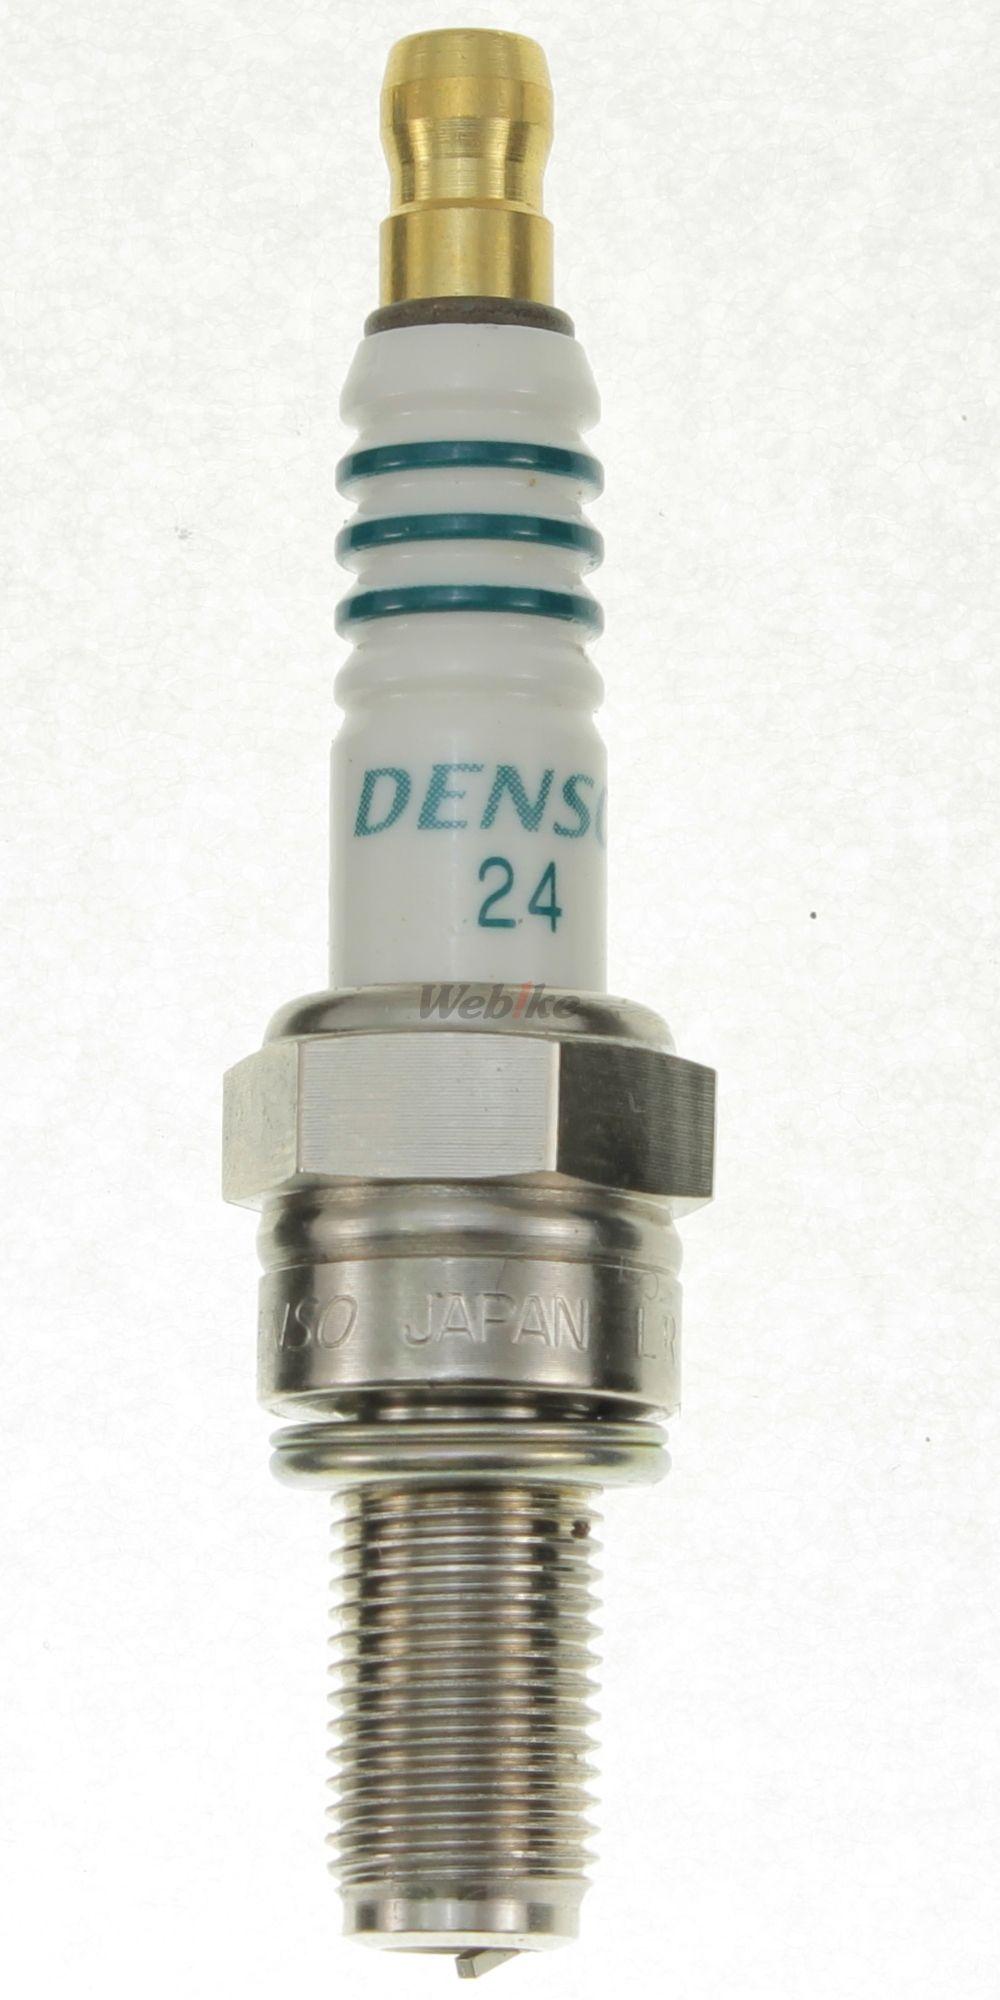 【DENSO】競賽型 銥合金 火星塞 IU01-24 - 「Webike-摩托百貨」